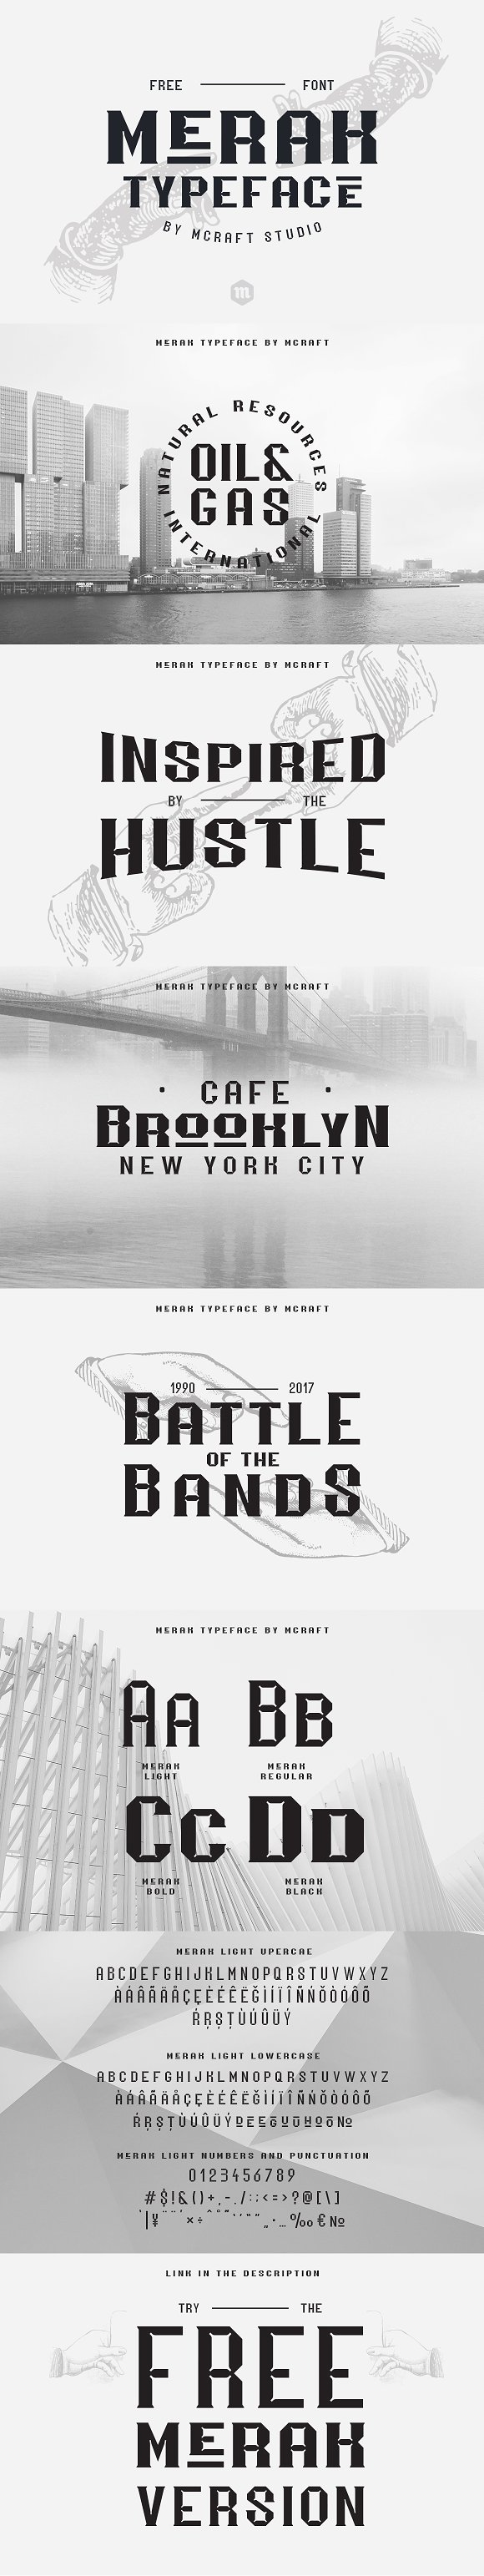 Merak Typeface